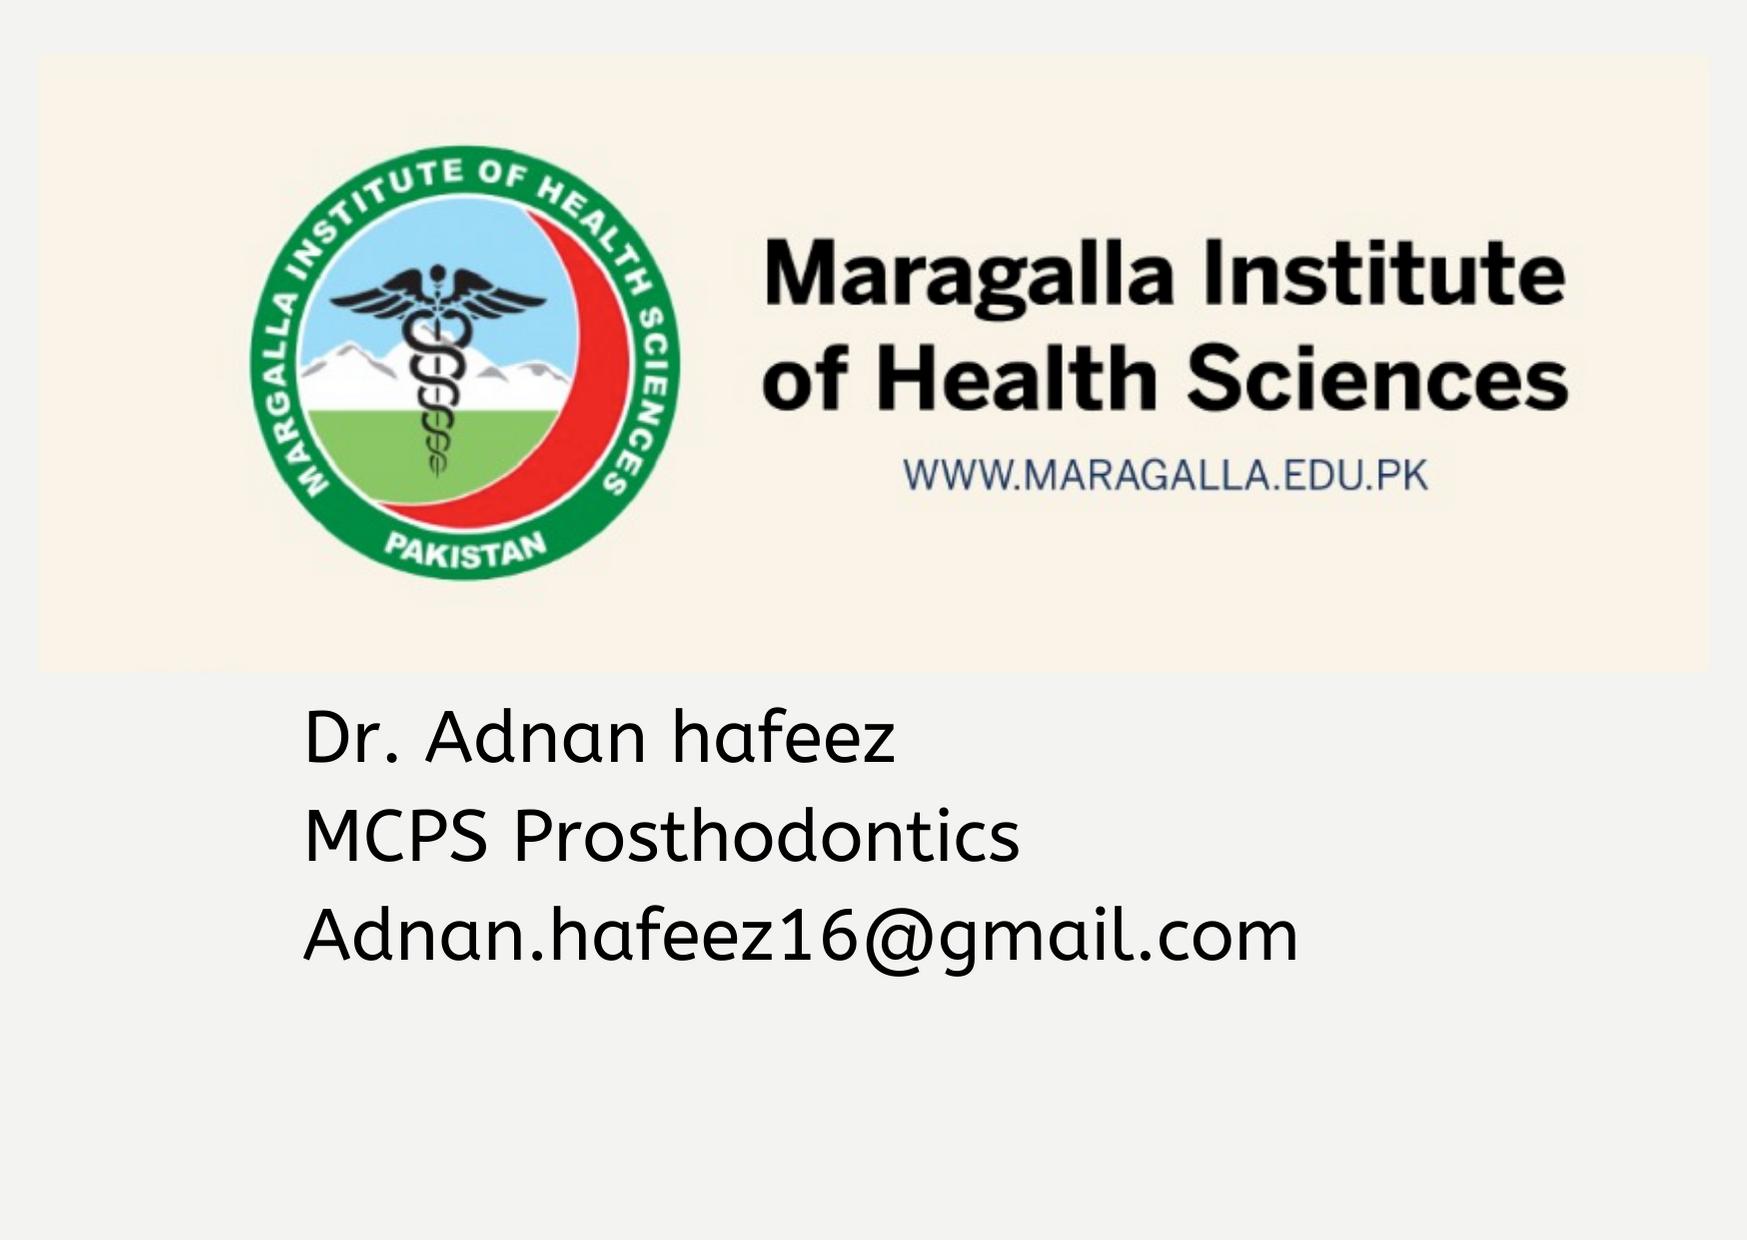 Dr. Adnan hafeez about MIHS